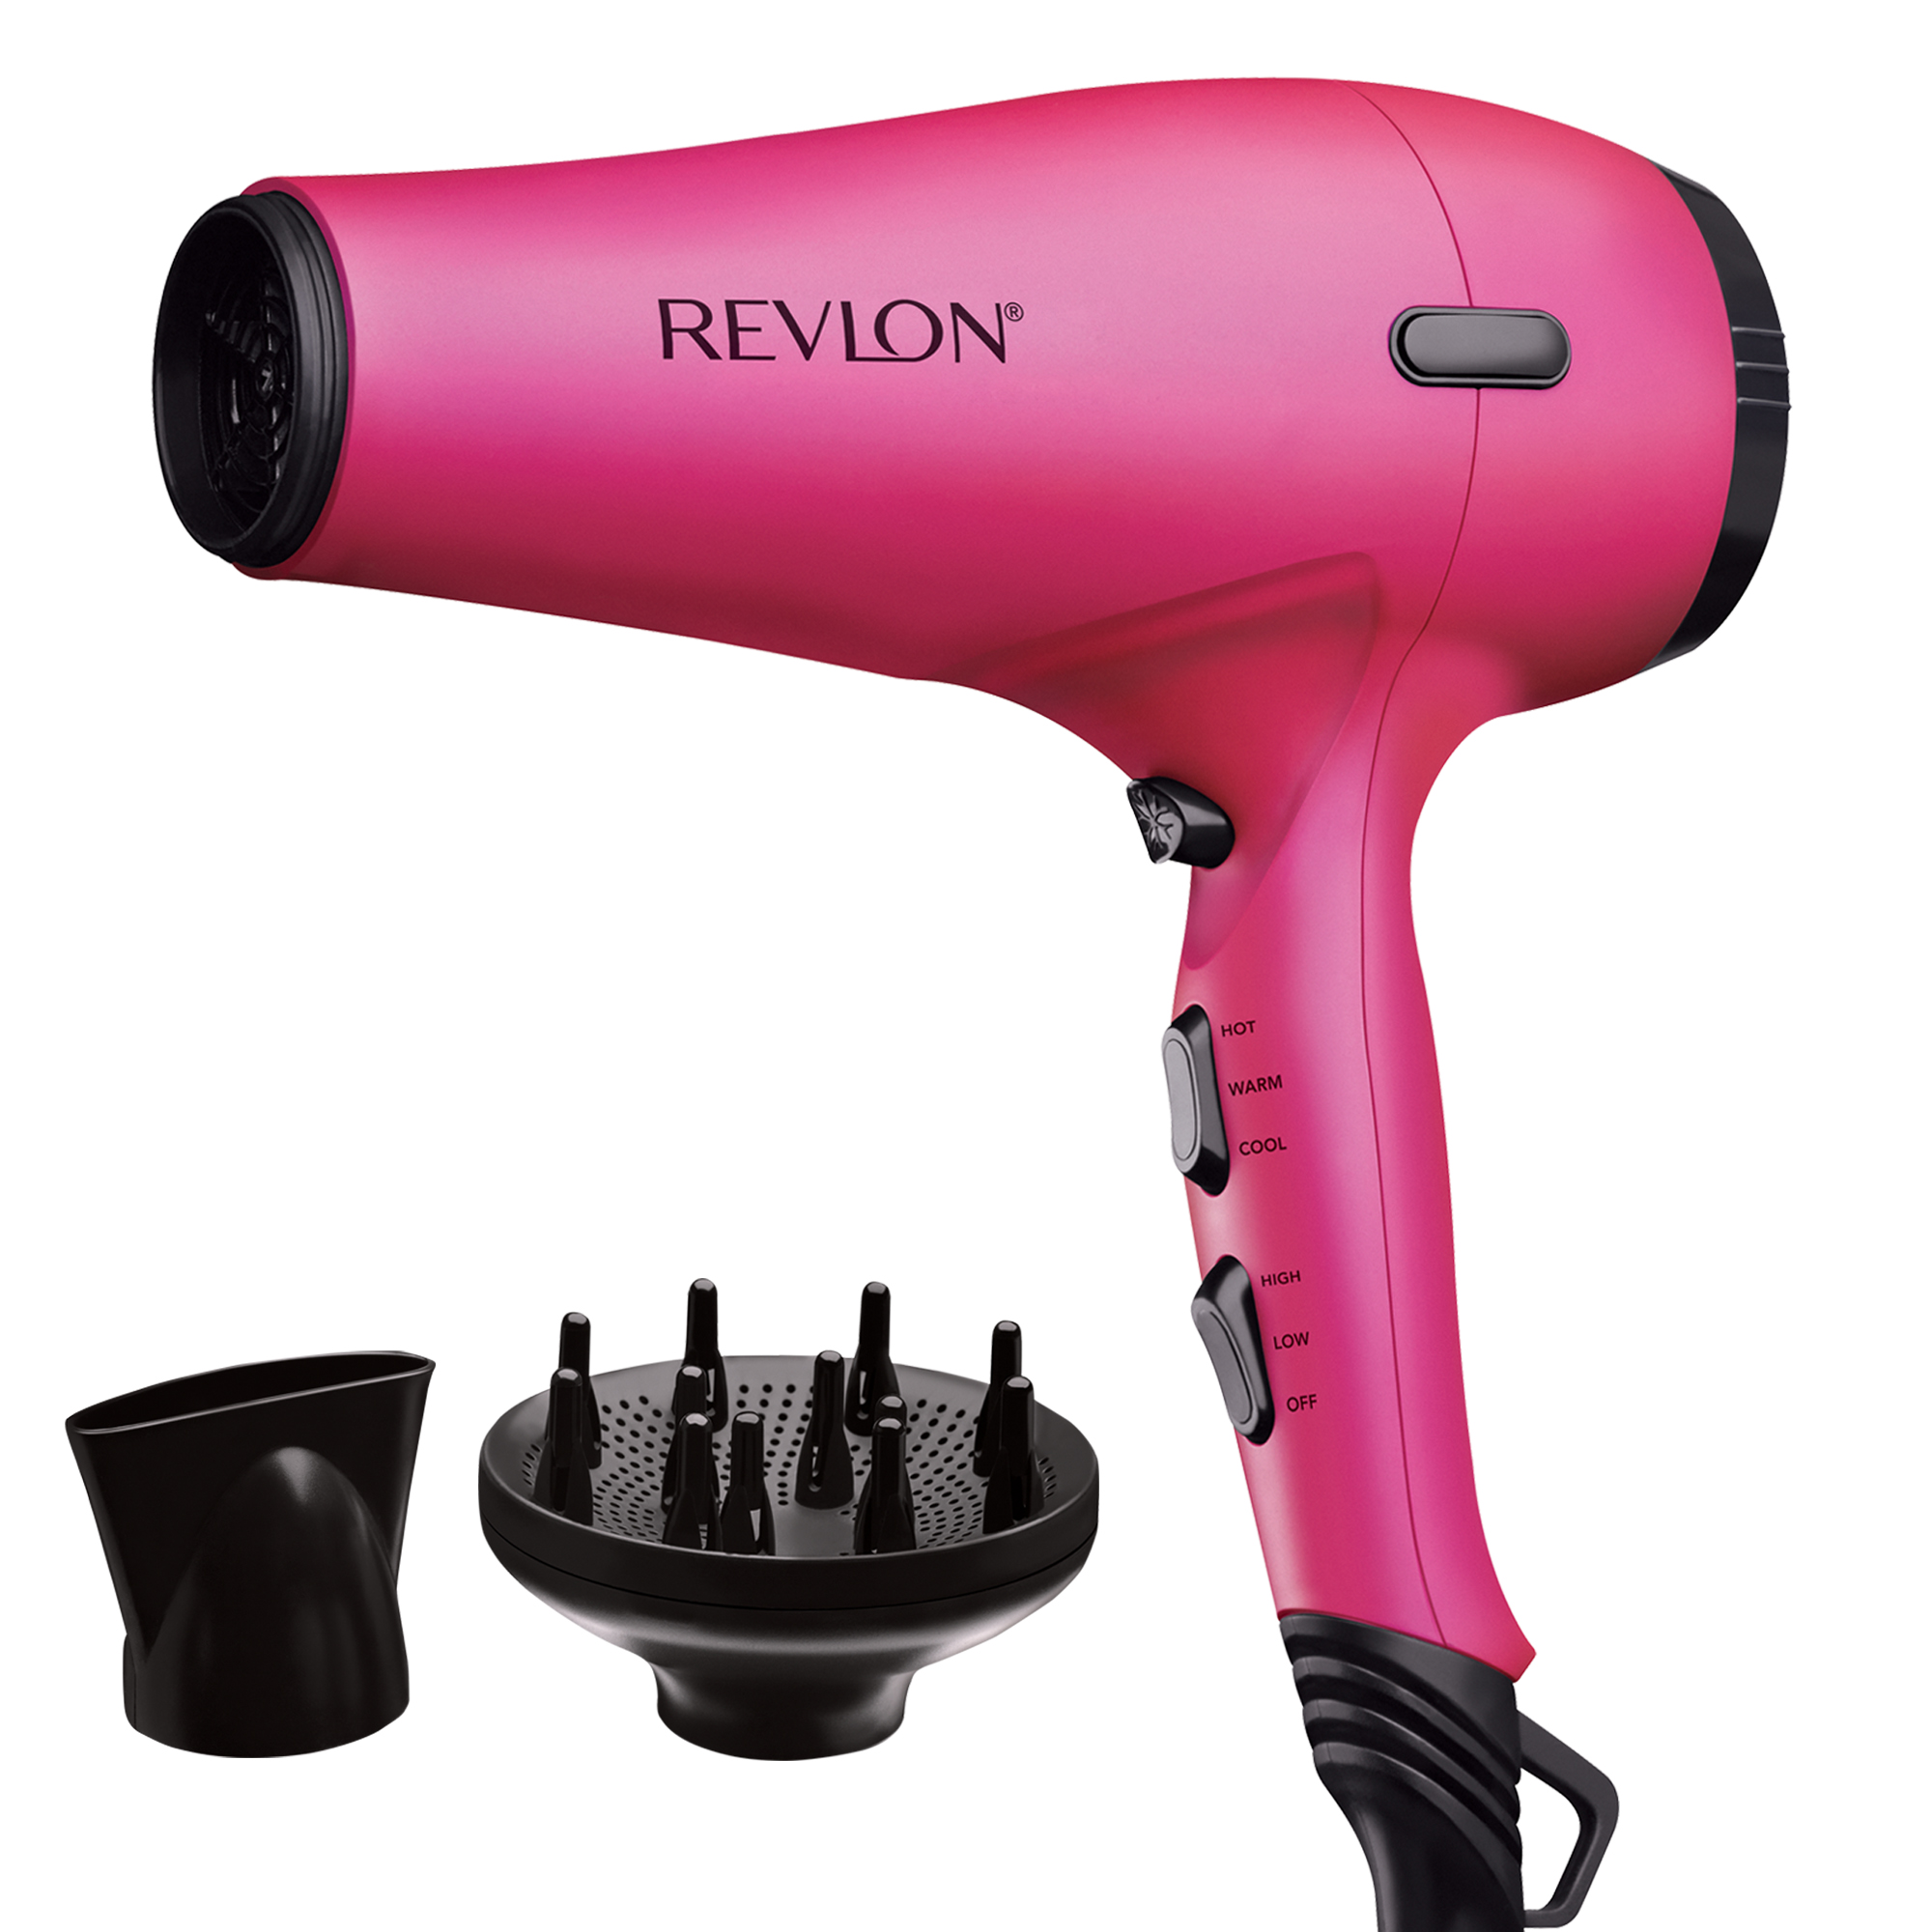 Revlon Pro Collection Fast Style RVDR5141PNK 1875W Tourmaline AC Motor Hair Dryer, Pink